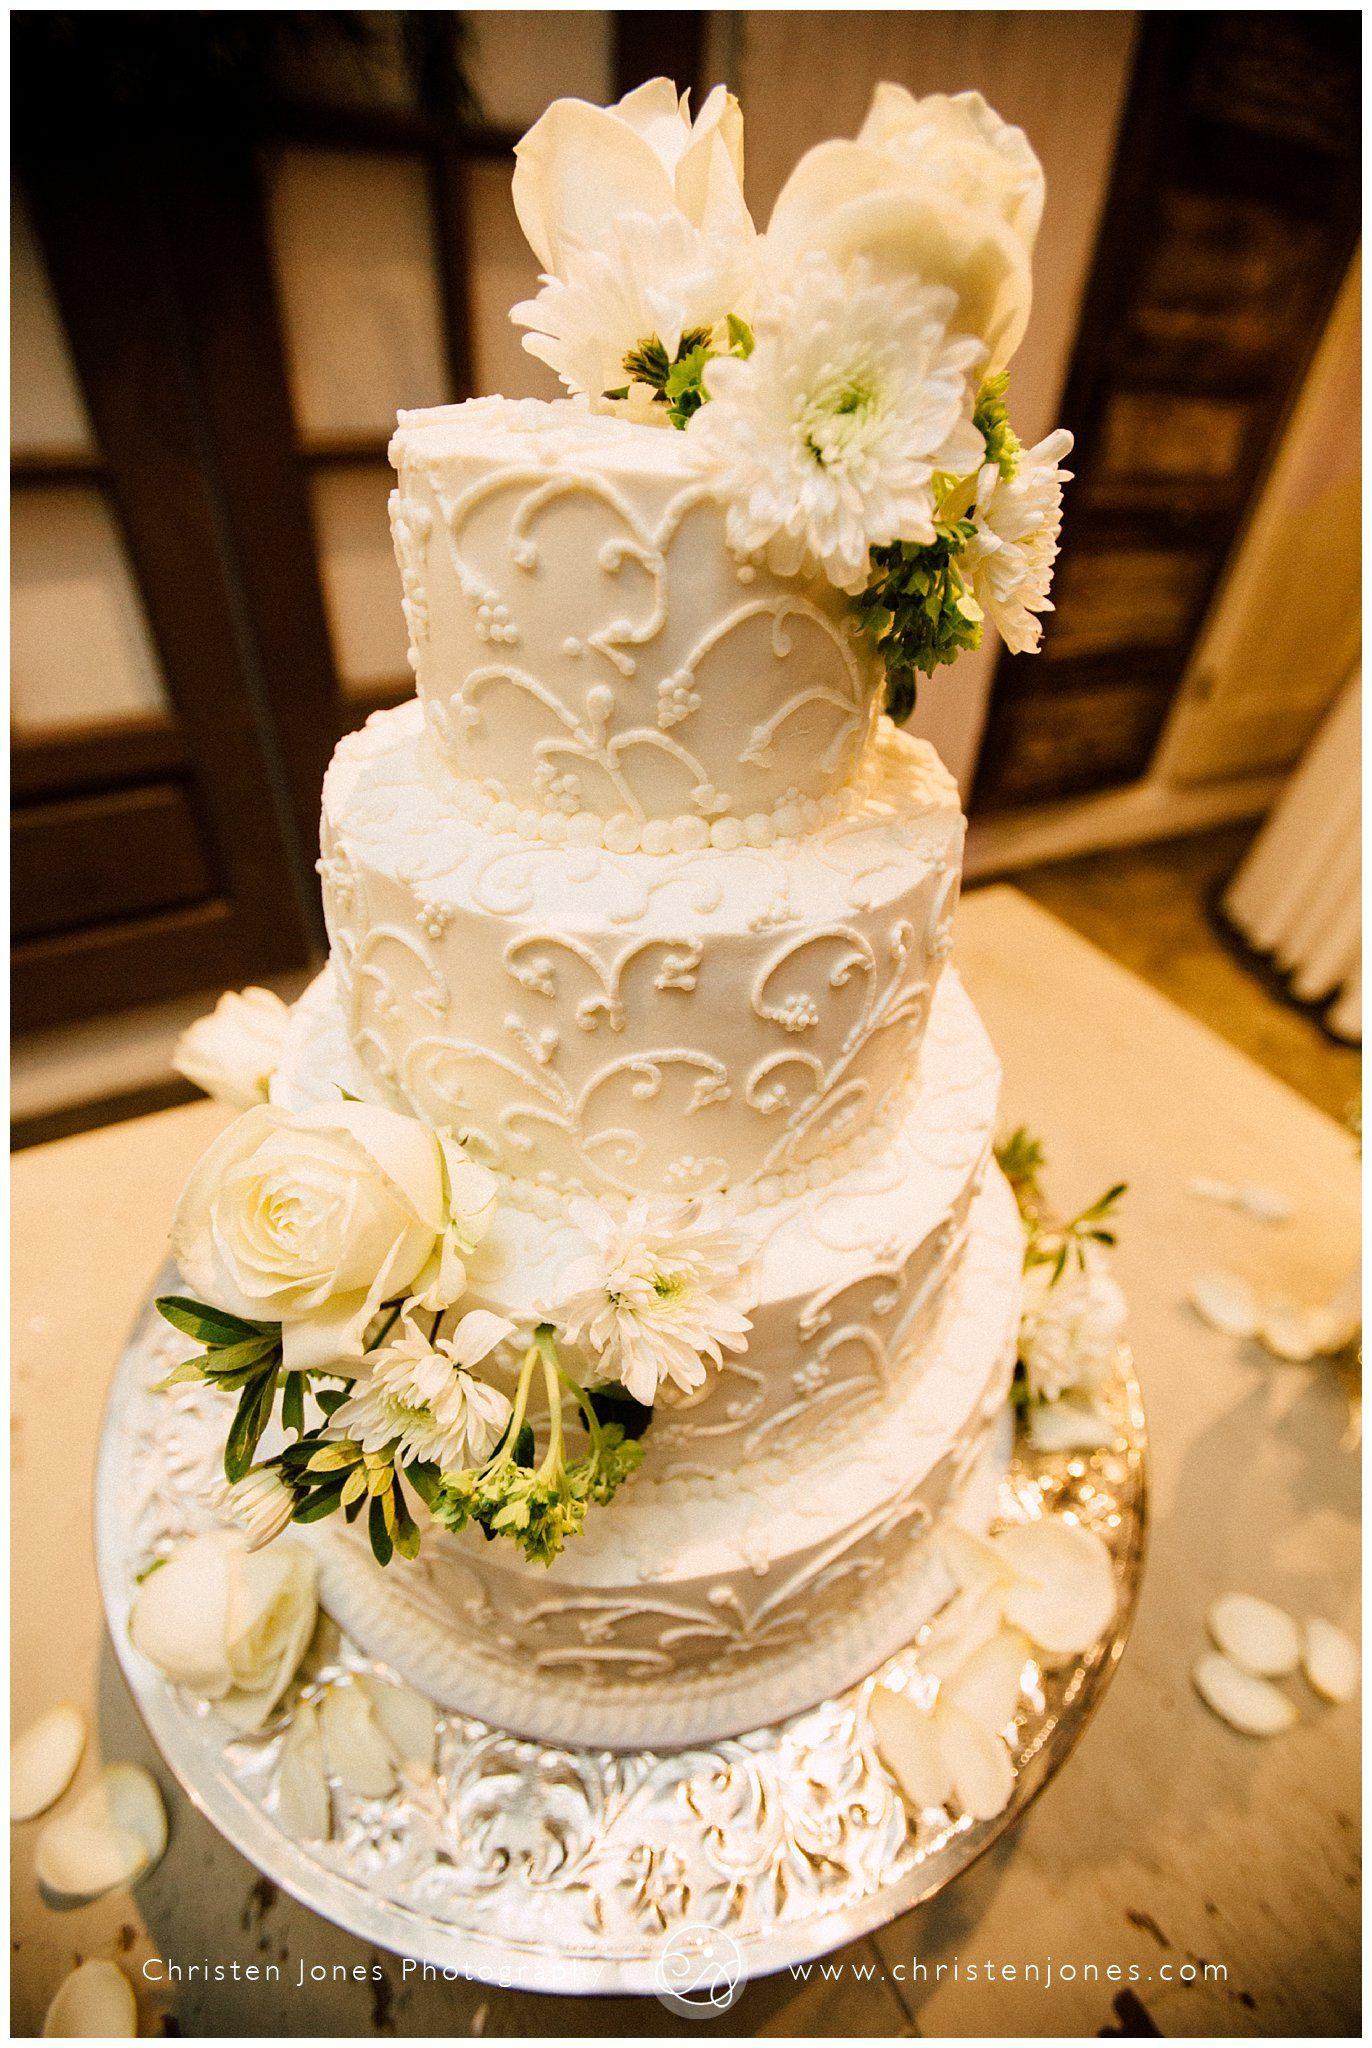 White Flowers On Wedding Cake